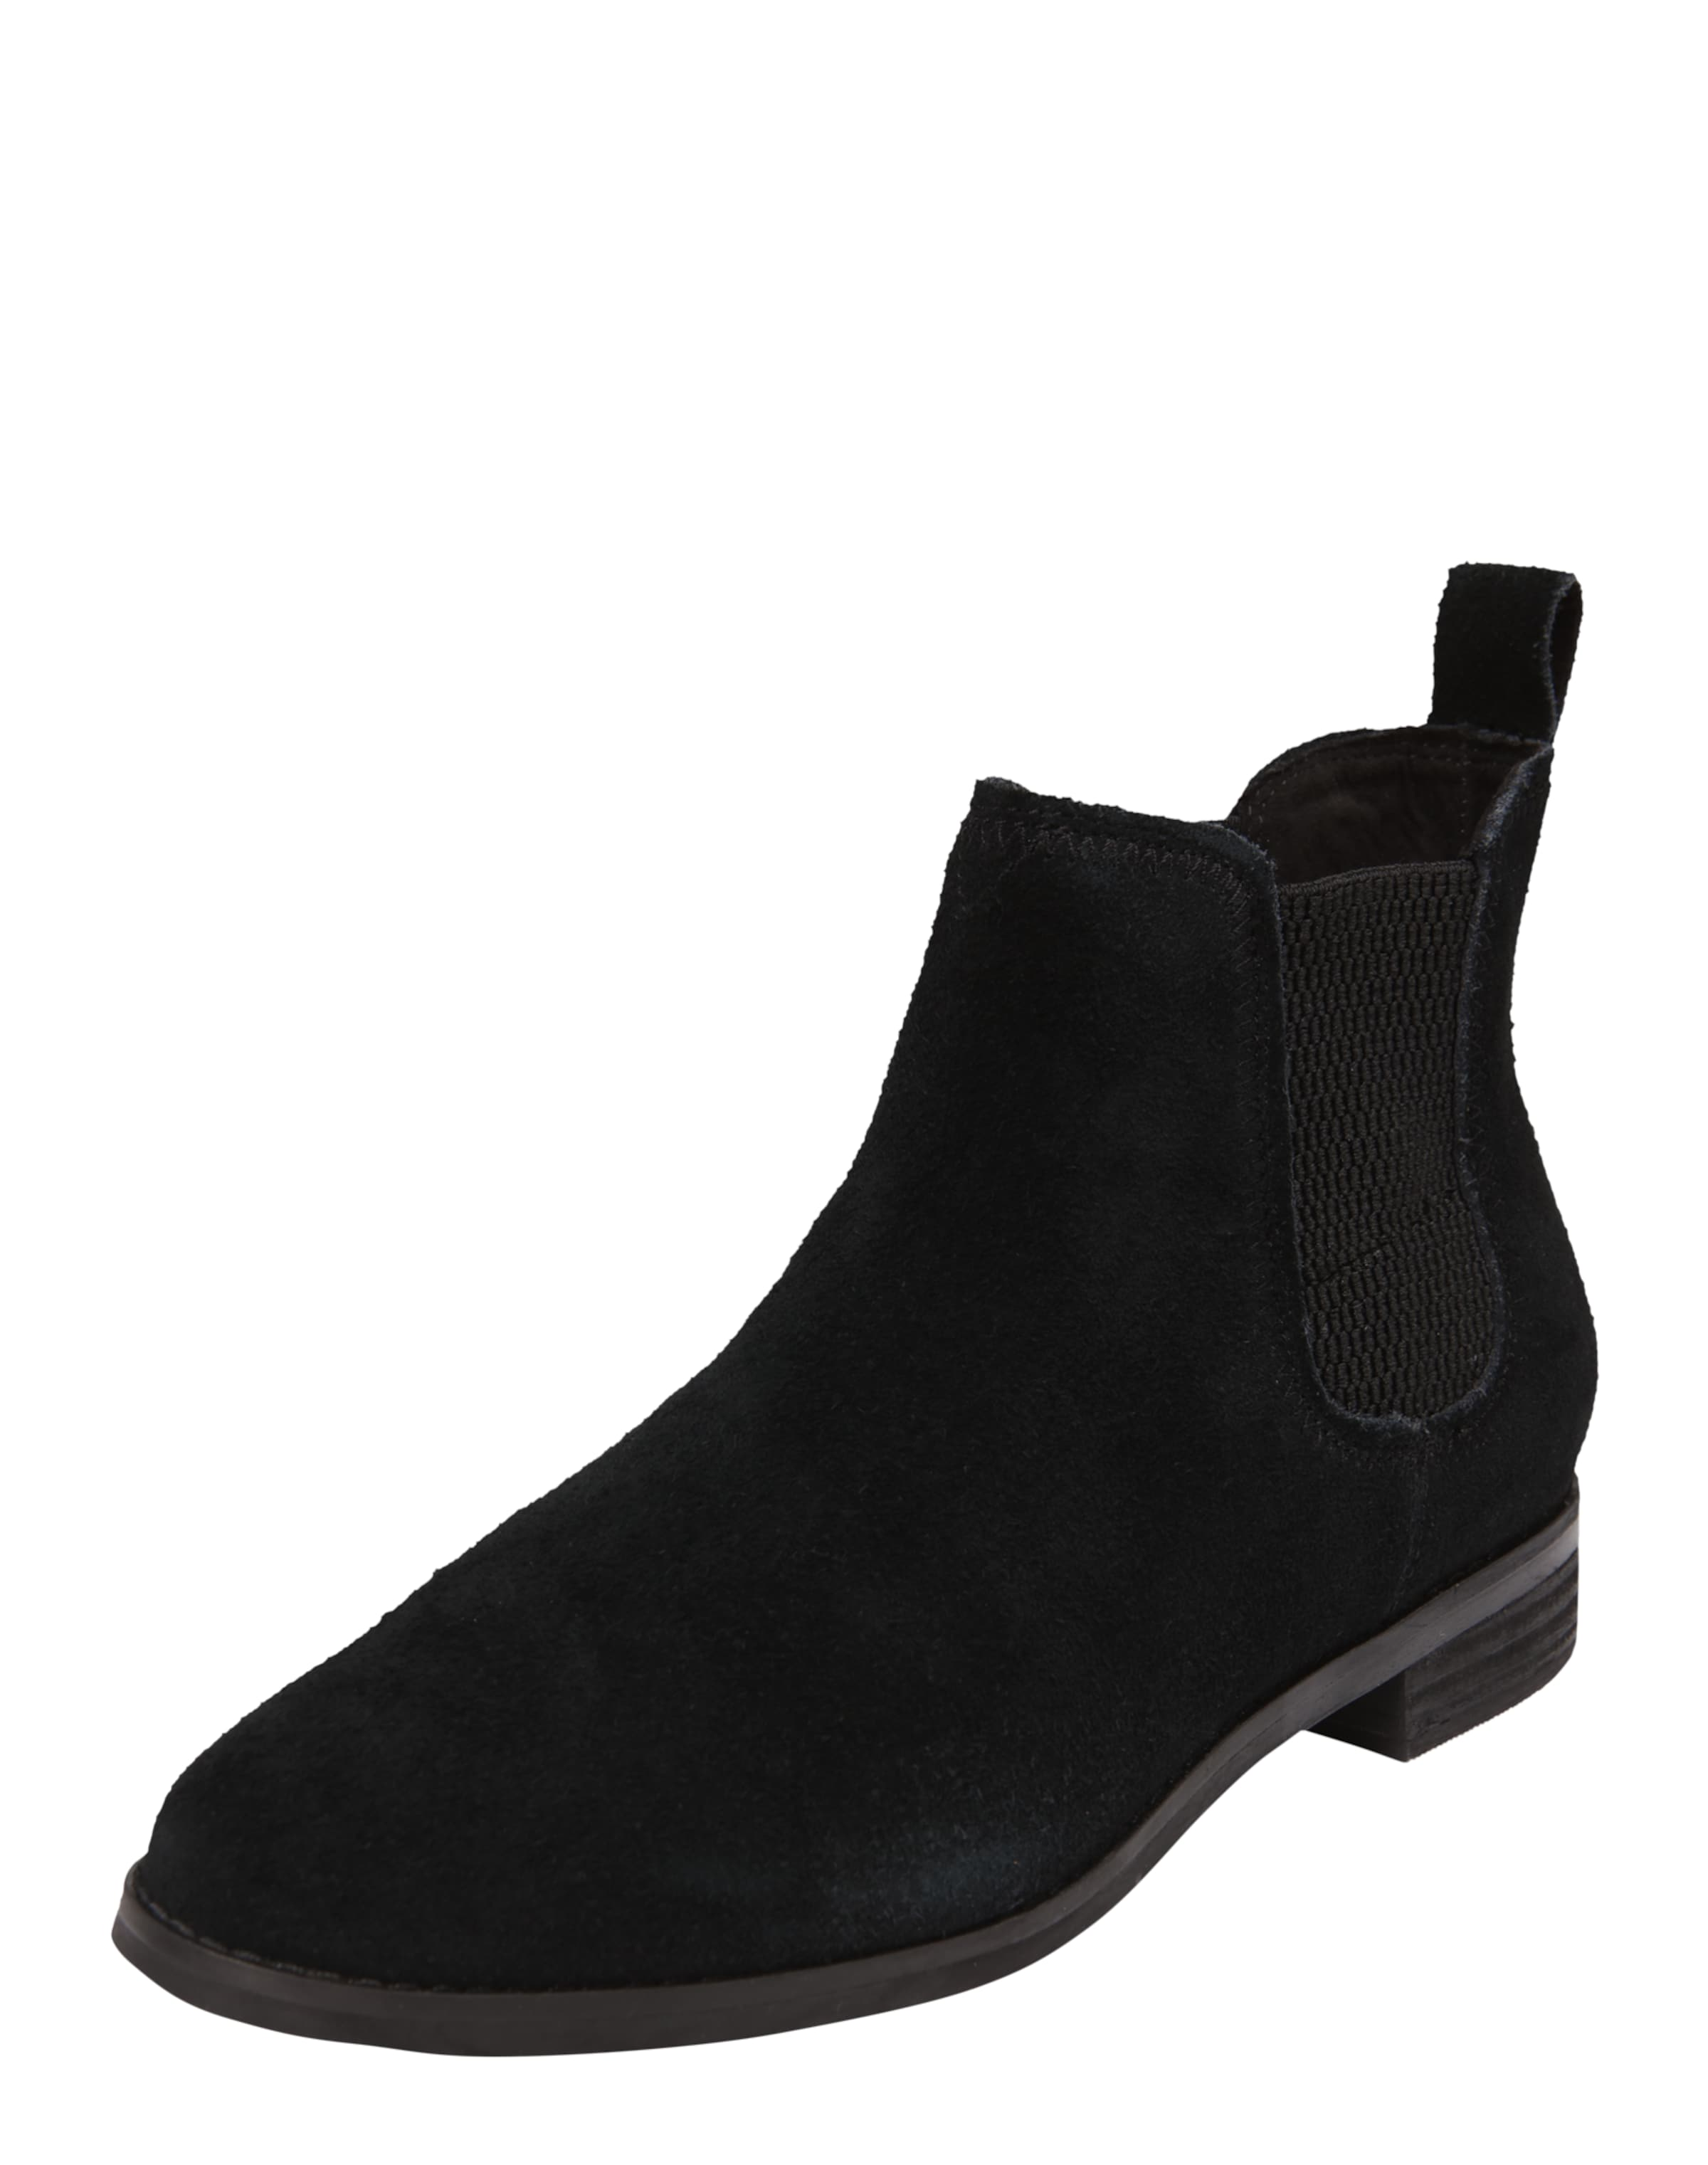 TOMS Chelsea-Boots 'Ella' schwarz erbqNk3